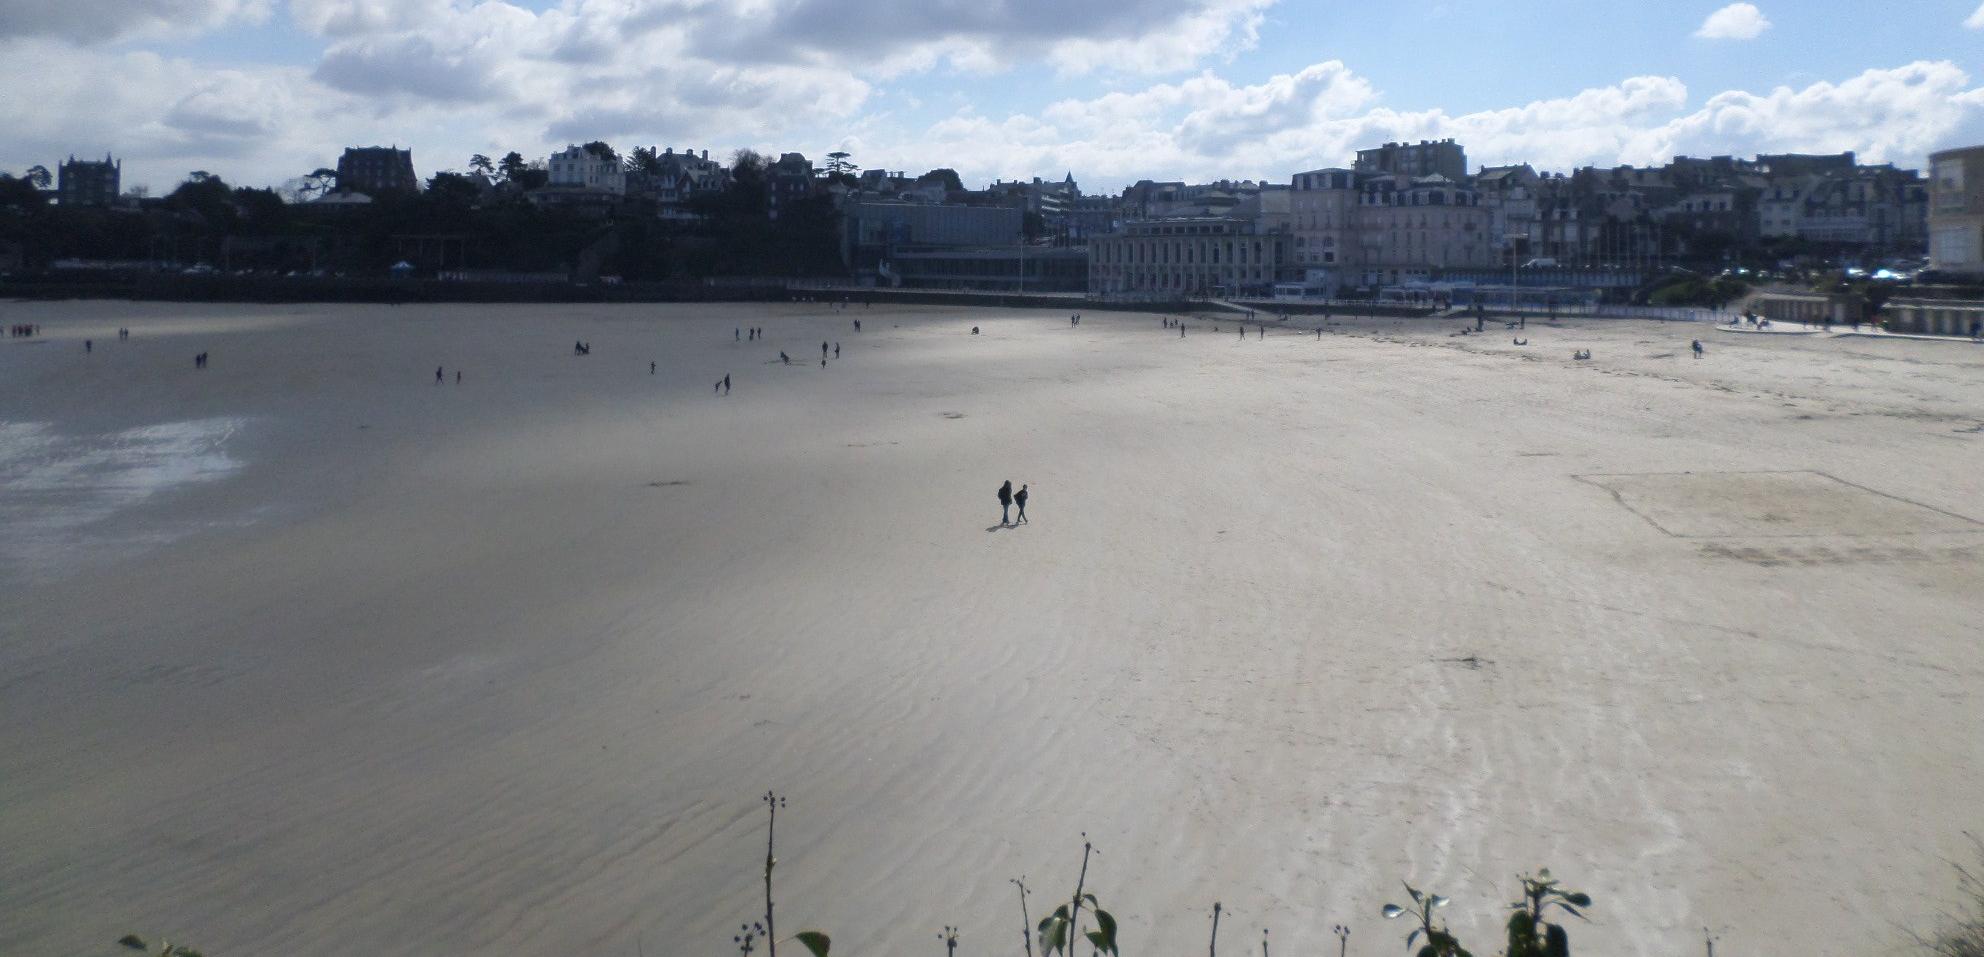 dinard-plage-de-l-ecluse-up-pool-apr15